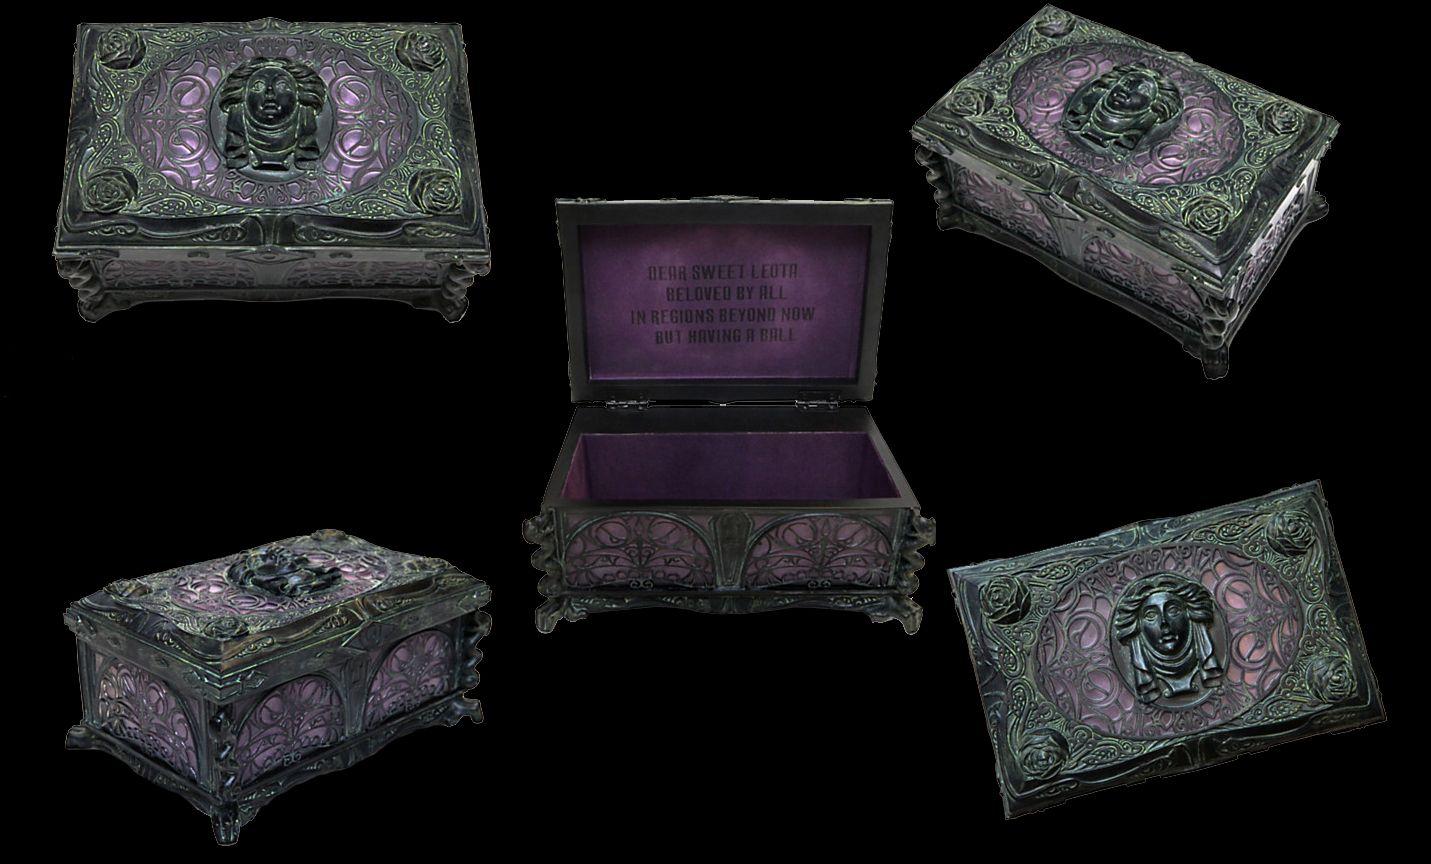 Haunted Mansion Musical Jewelry Box Madame Leota Casket Case Madame